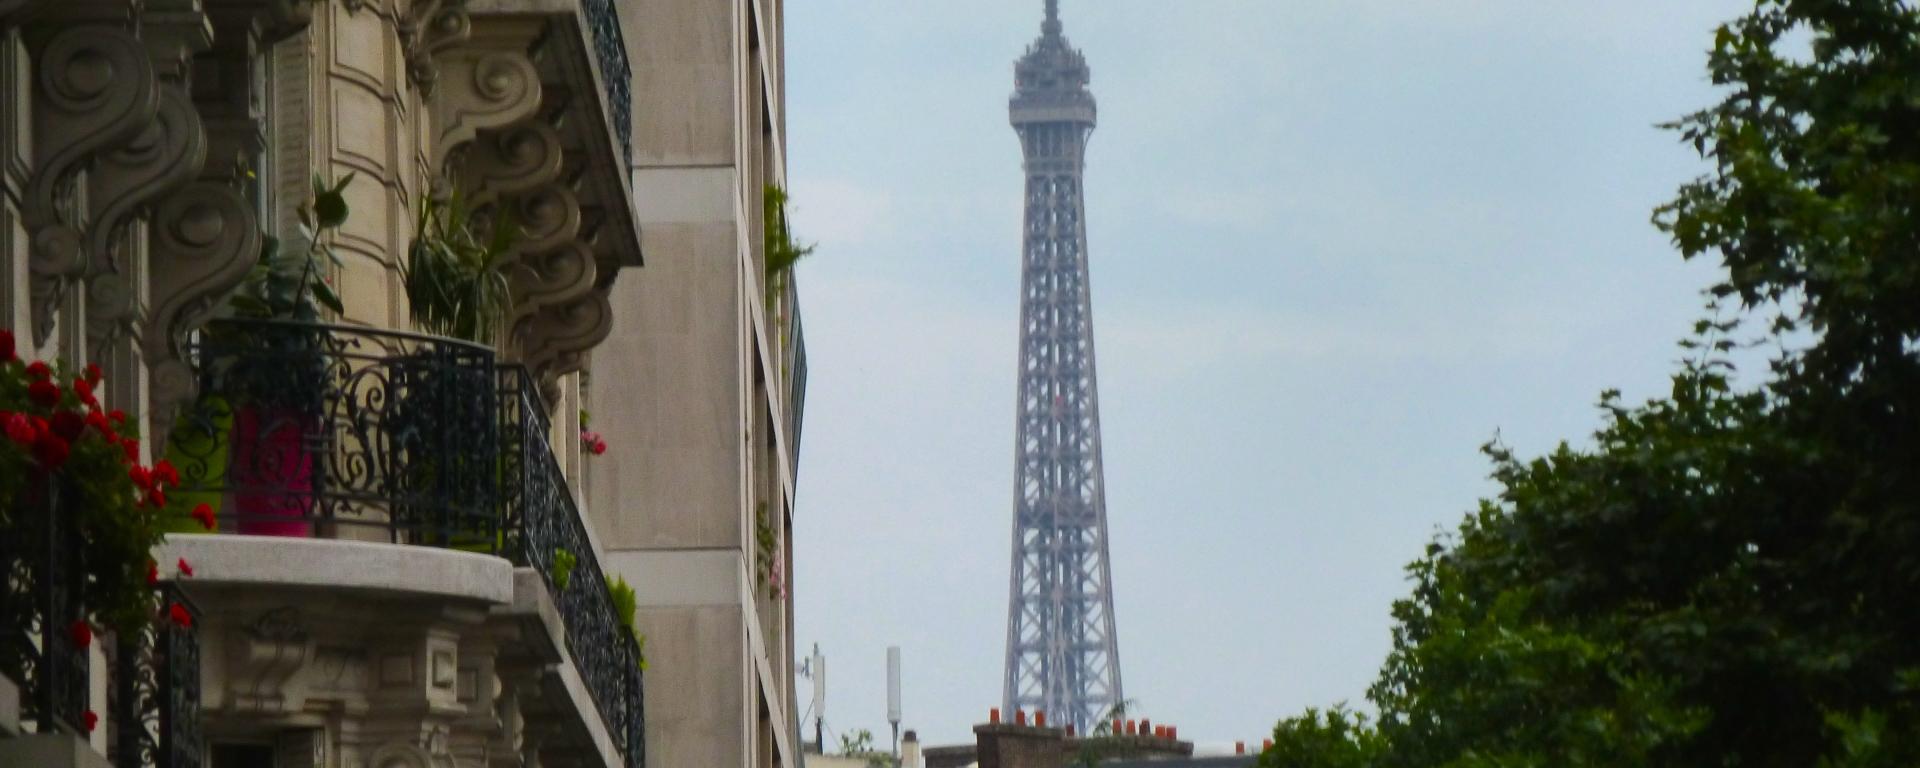 My first glimpse of the Eiffel Tower. Anika Mikkelson www.MissMaps.com